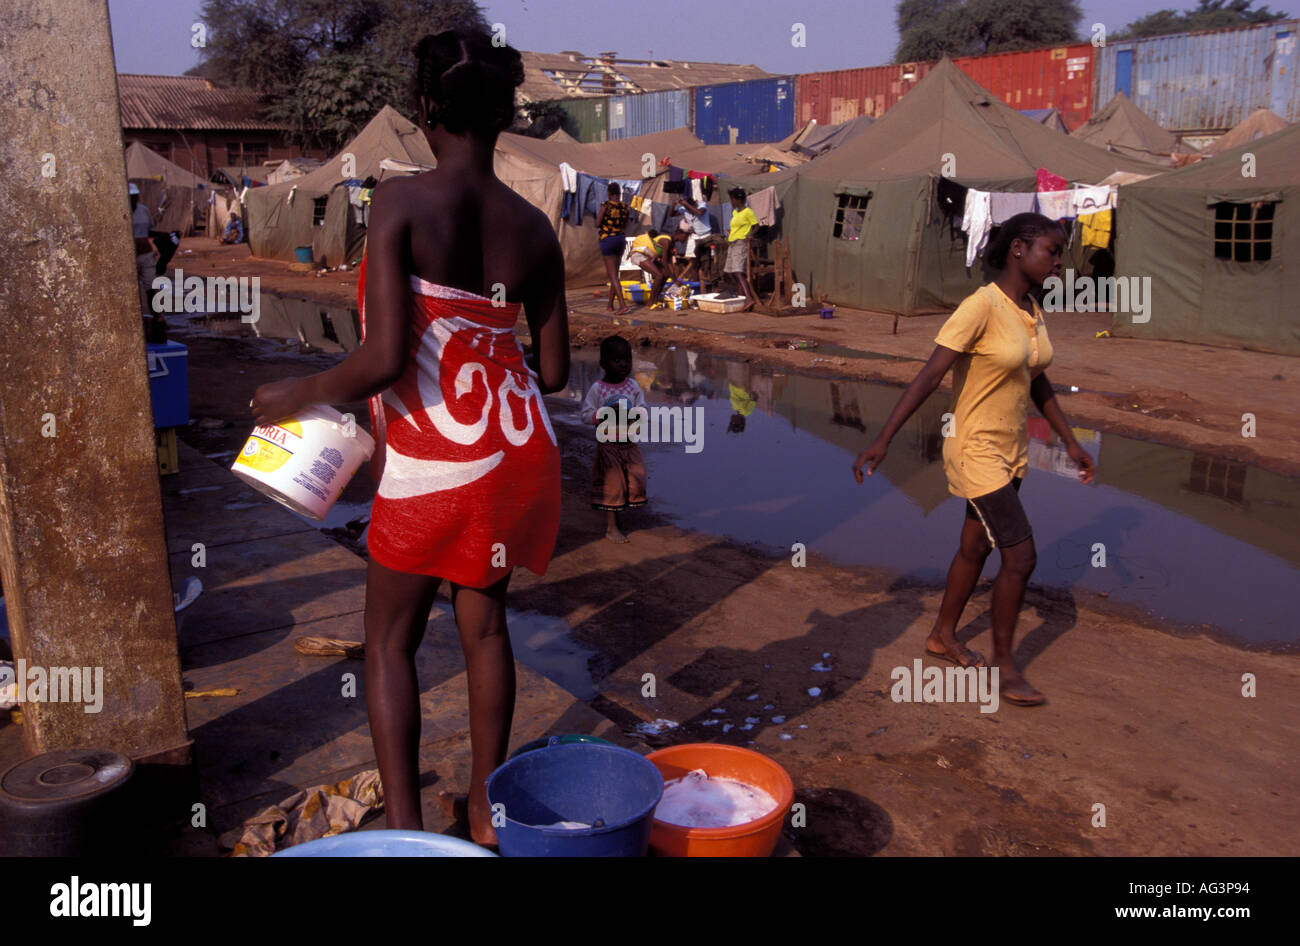 Angola Luanda IDP camp displaced people - Stock Image